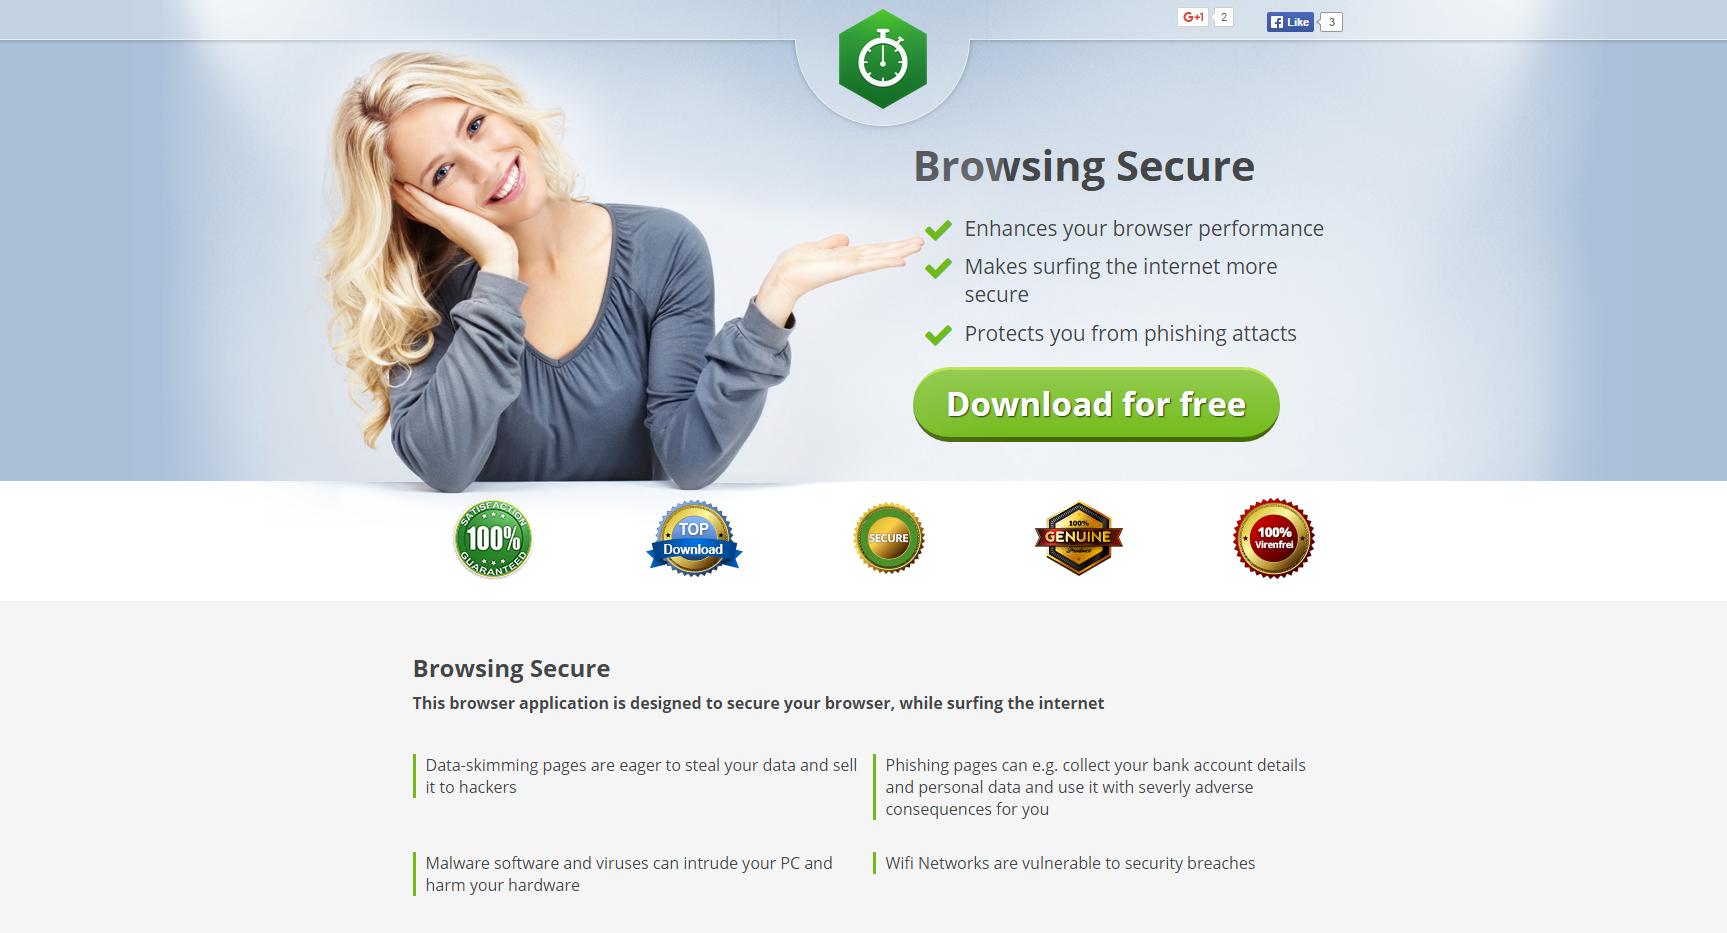 Browsing Secure